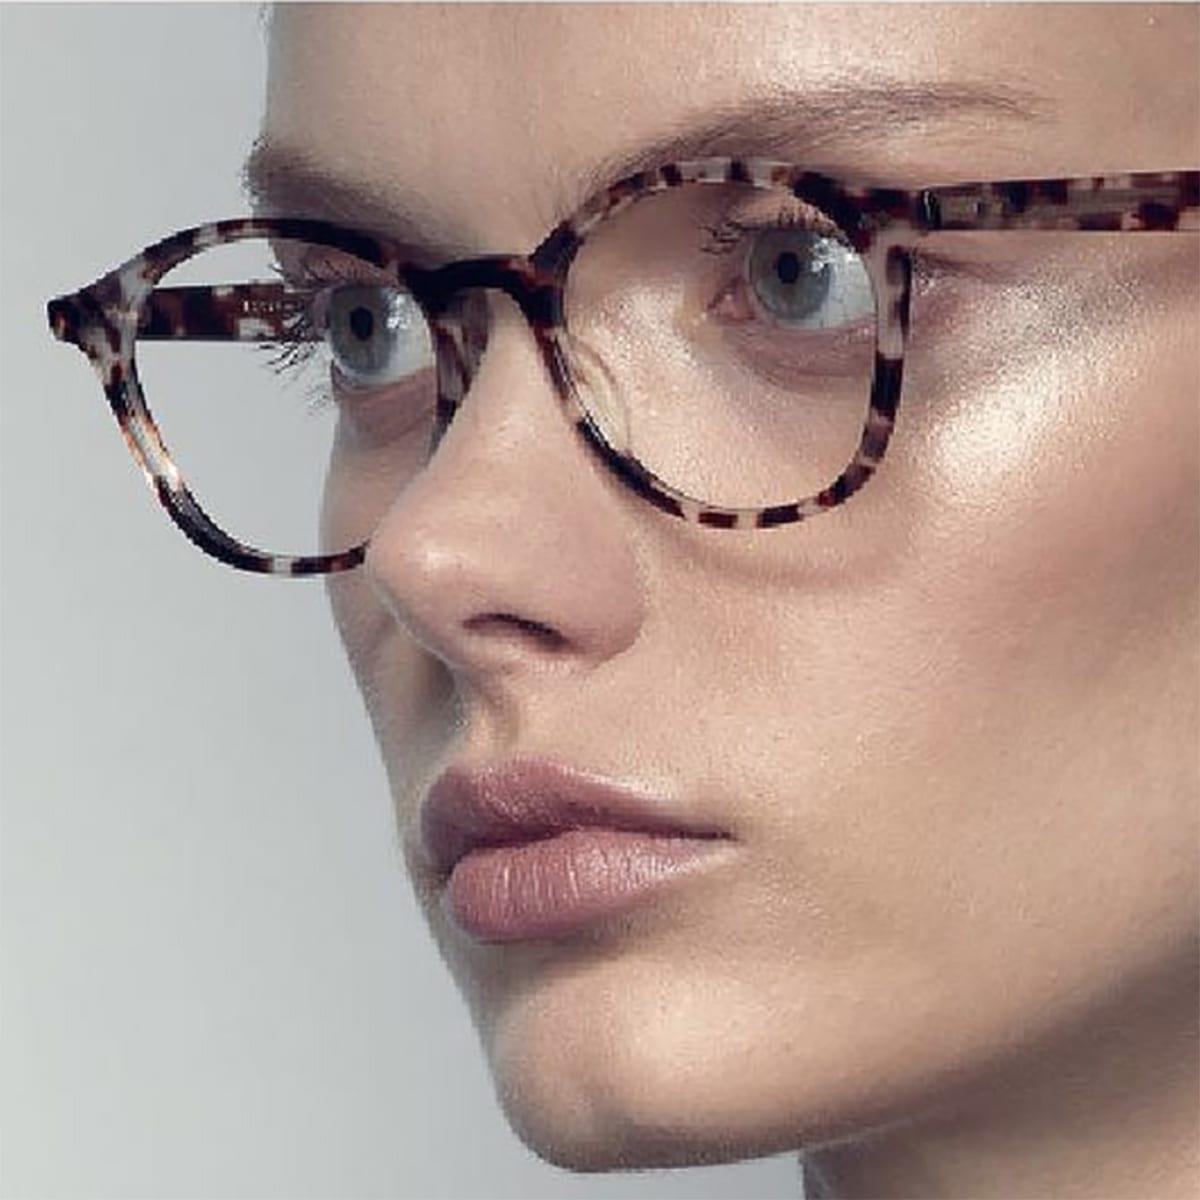 dita-eyewear-stockist-wolverhampton-shropshire-west-midlands-11